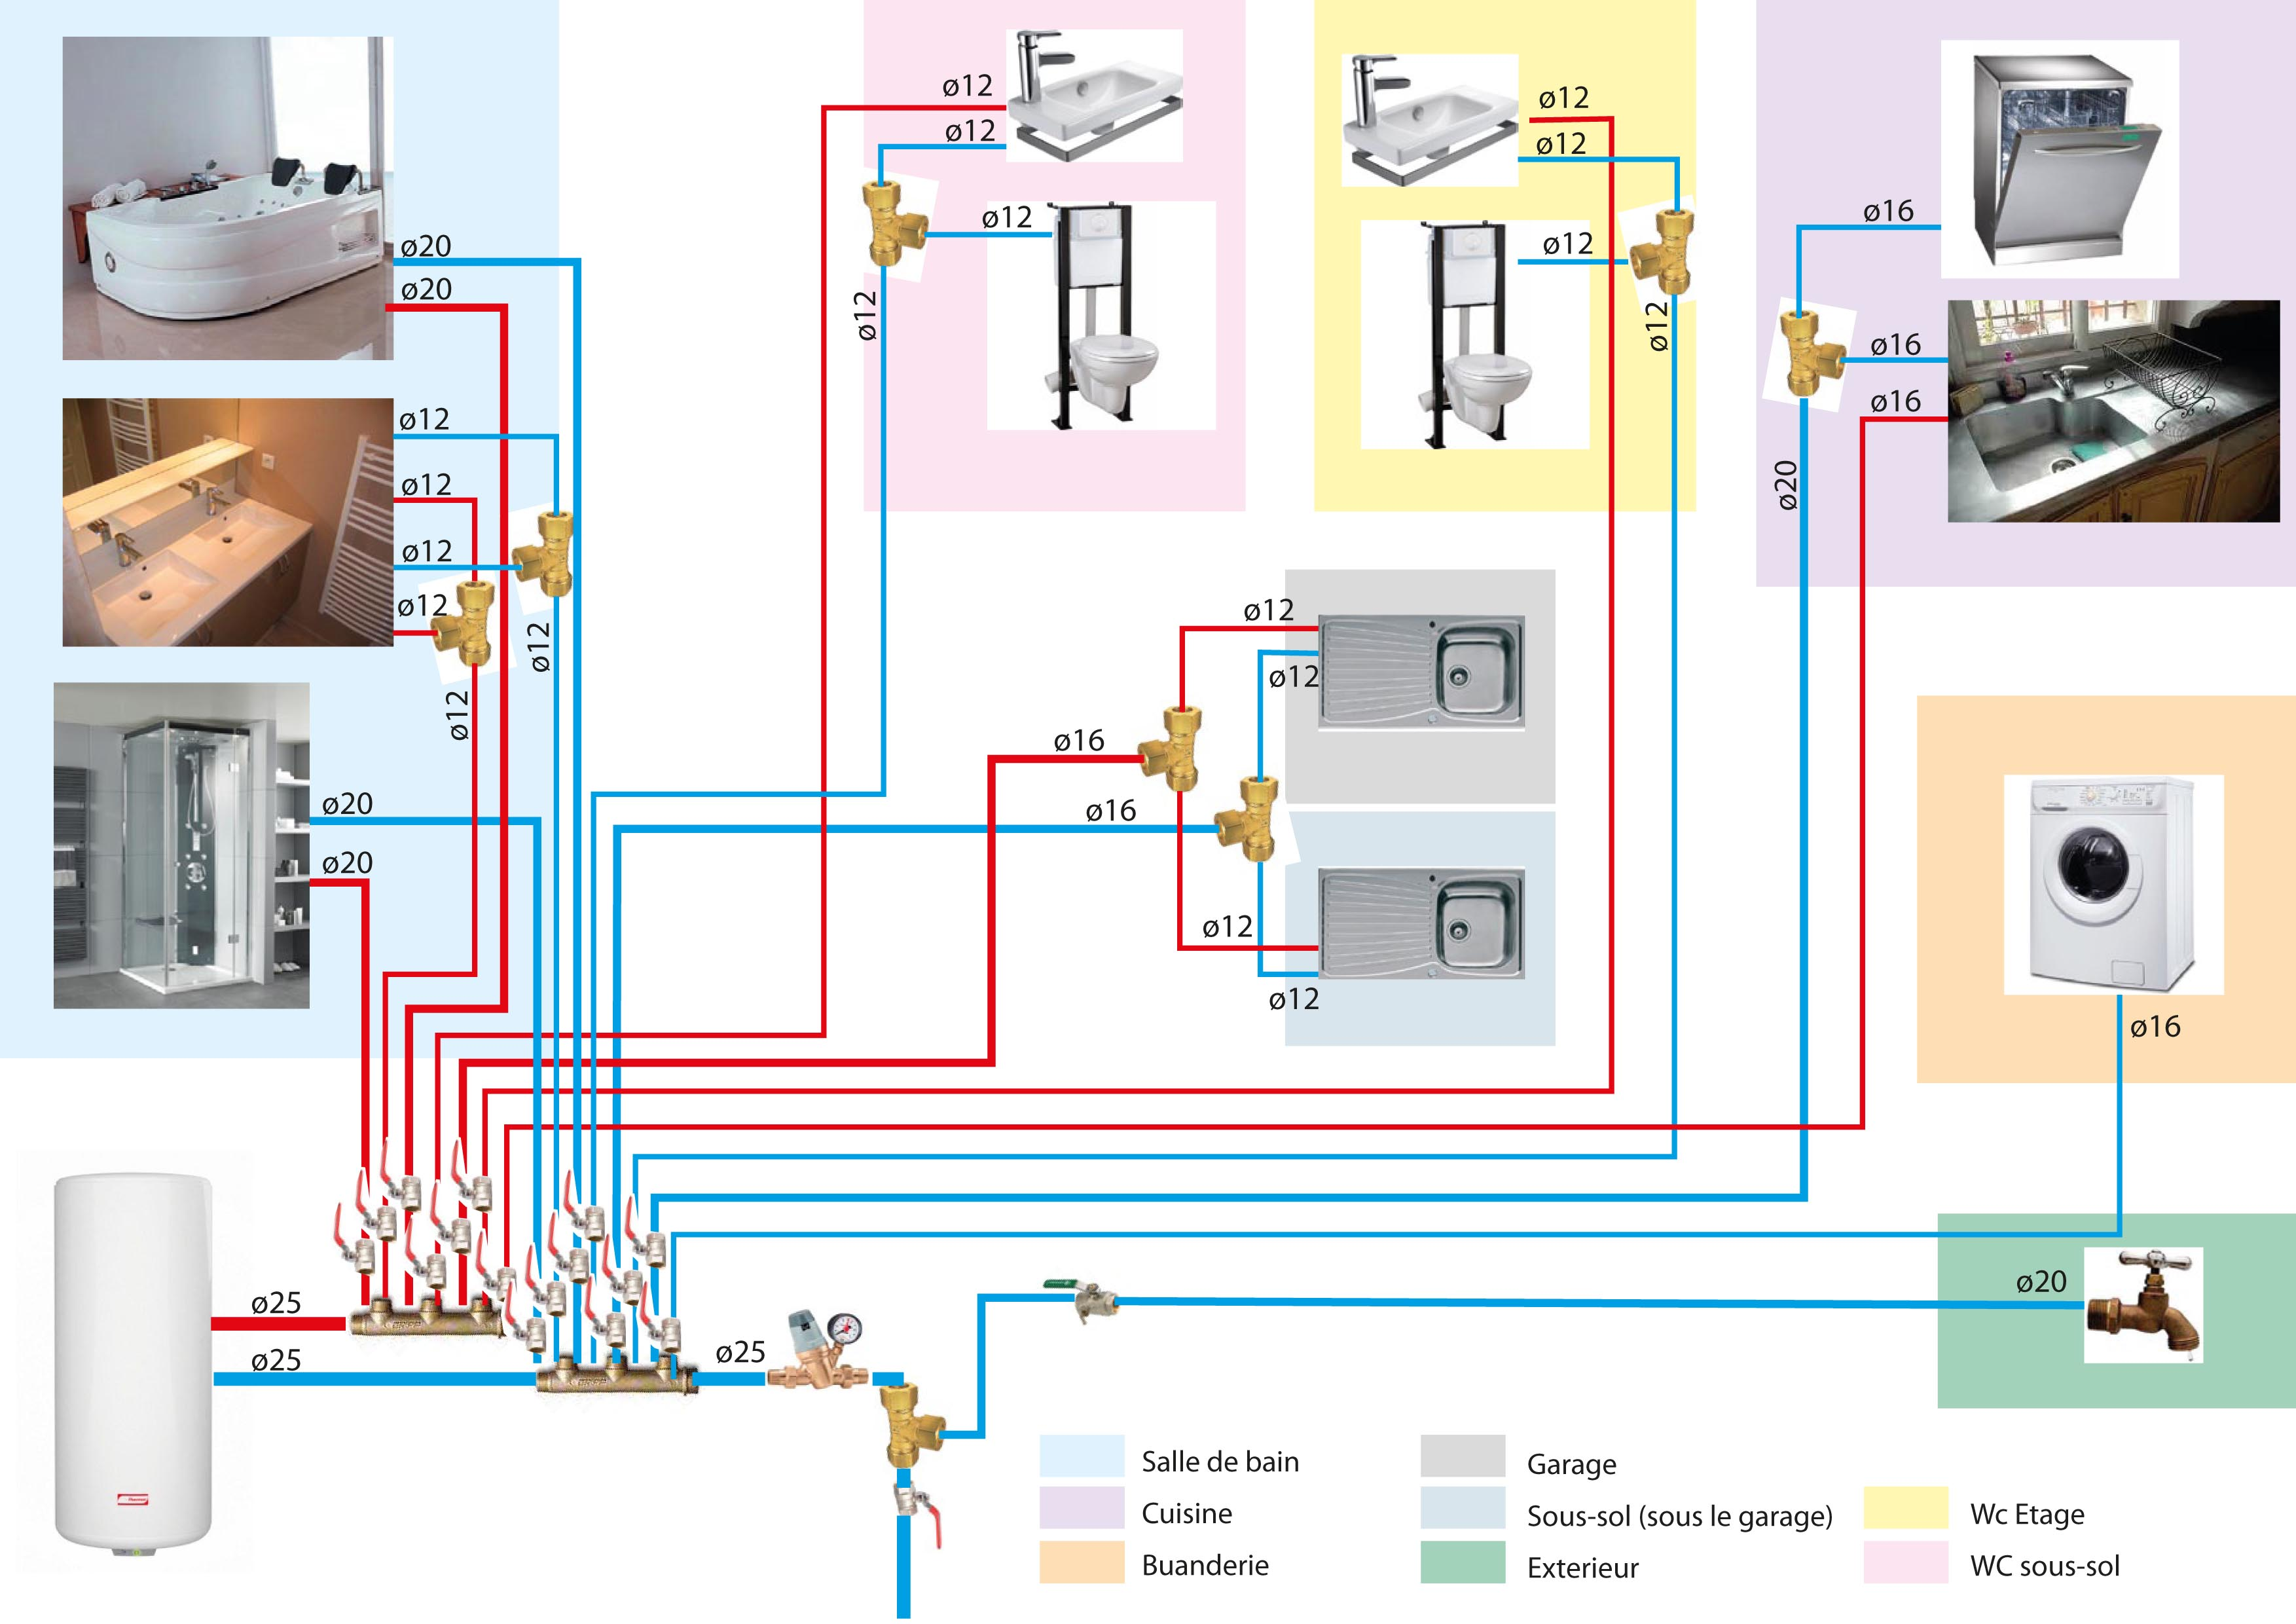 Plan plomberie à valider - 16 messages